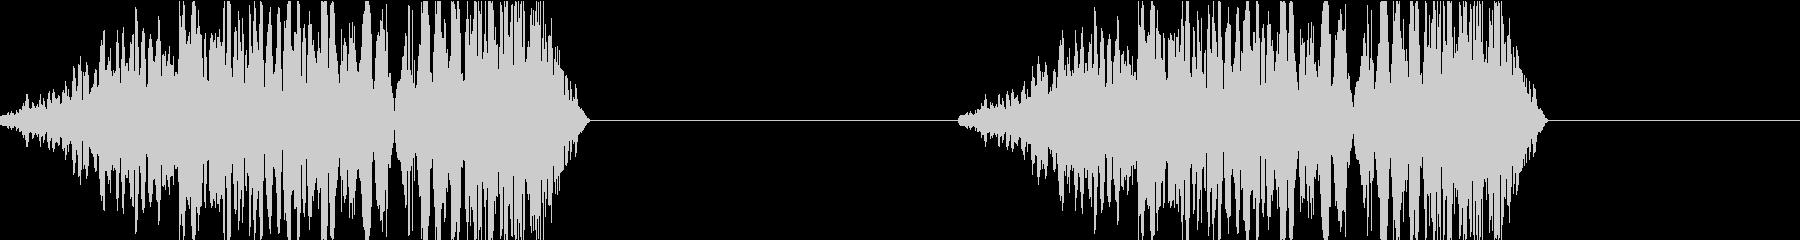 DJプレイ スクラッチ・ノイズ 192の未再生の波形